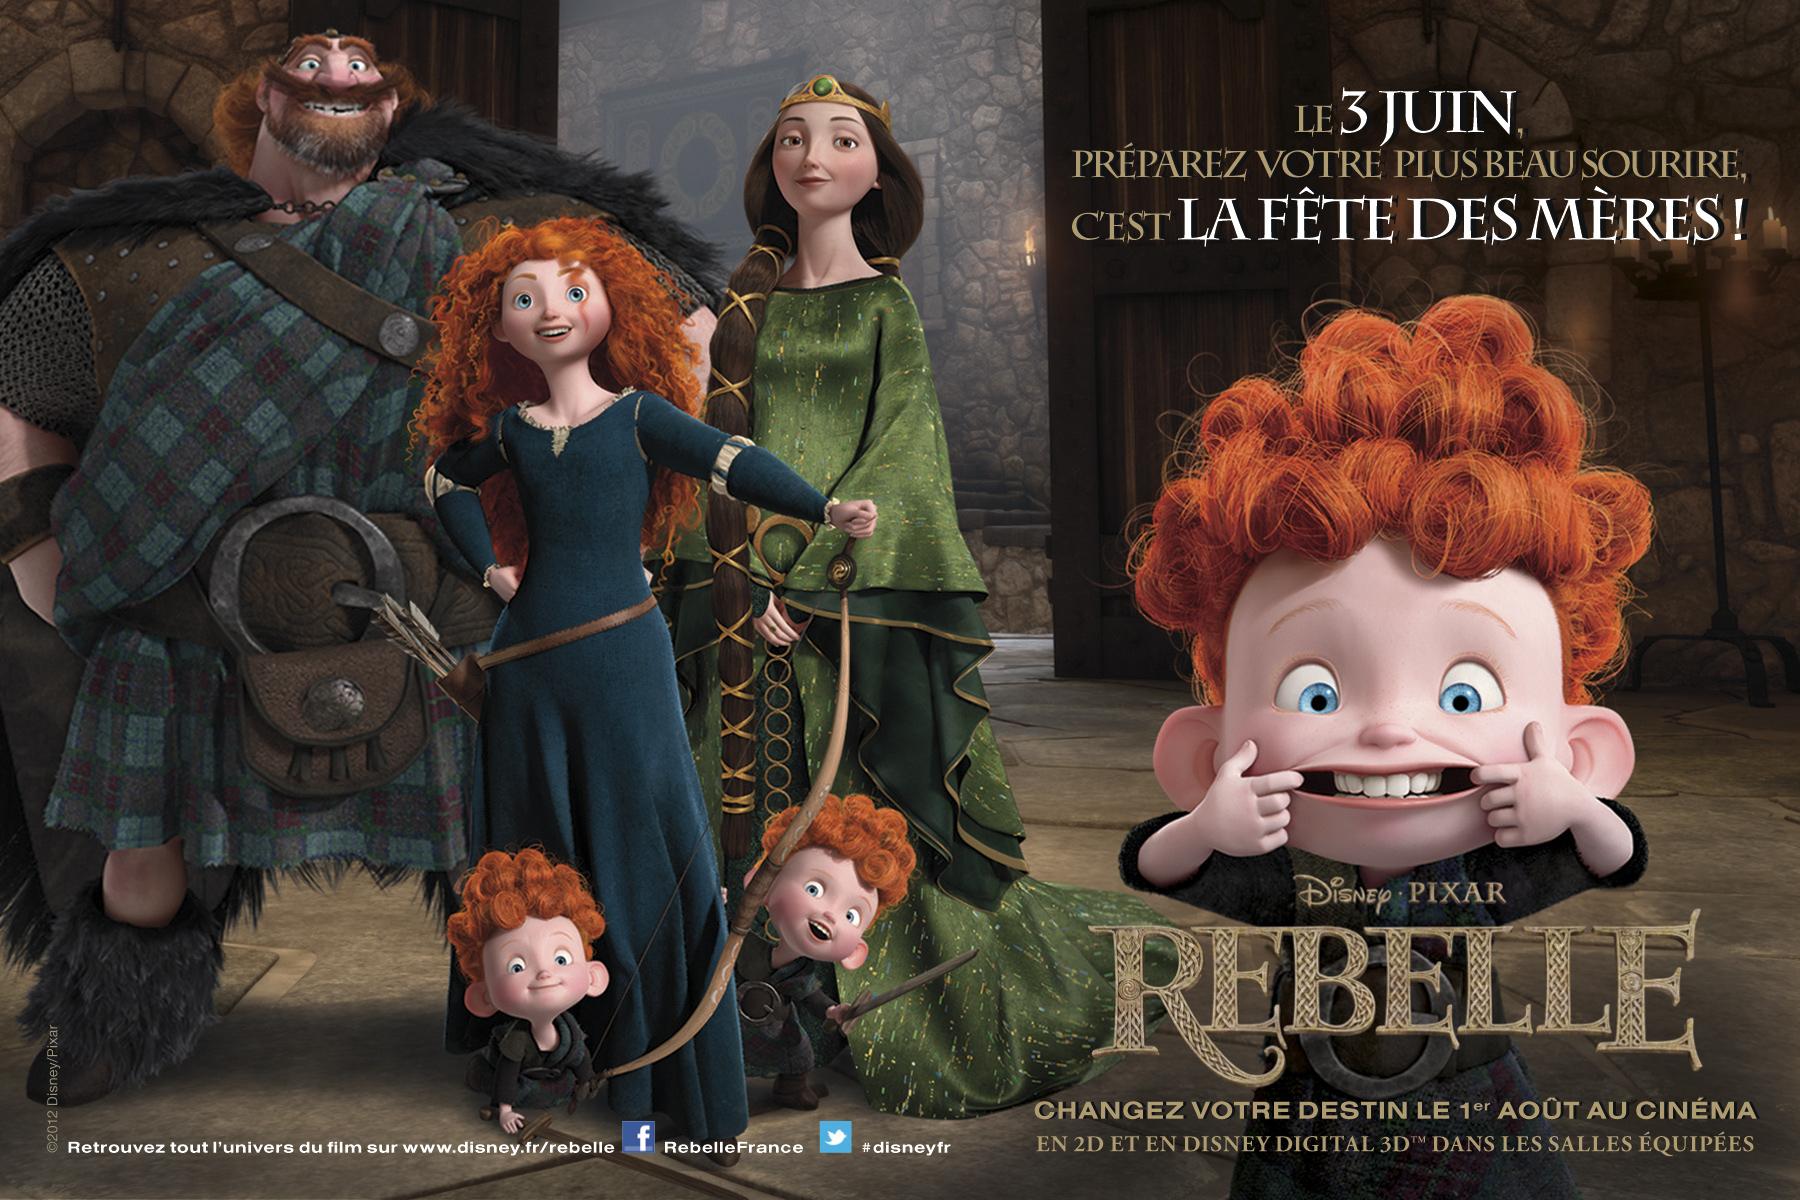 [Pixar] Rebelle (2012) - Sujet de pré-sortie - Page 3 Rebelle_ecard_fetedesmeres_HD